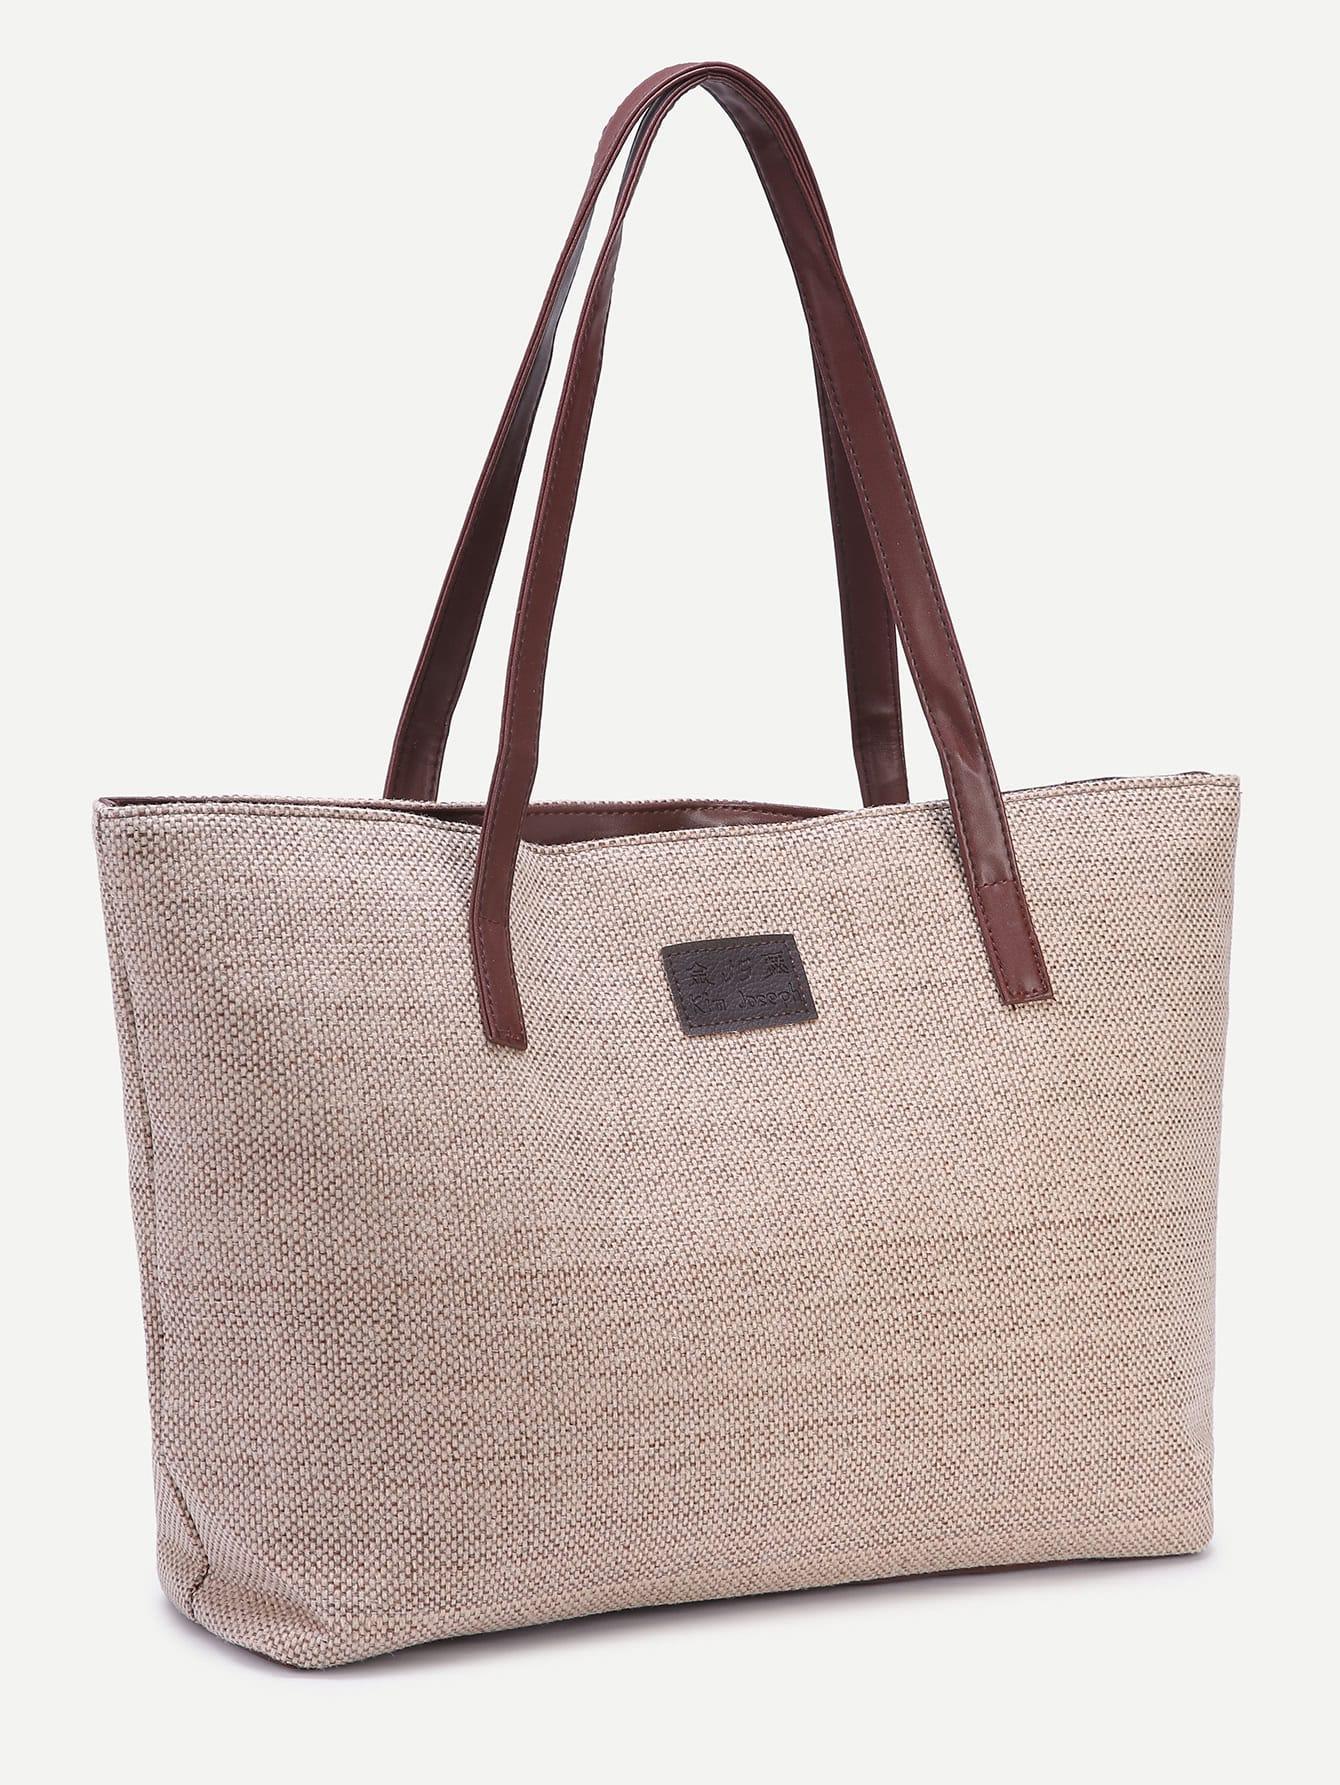 bag160907304_2